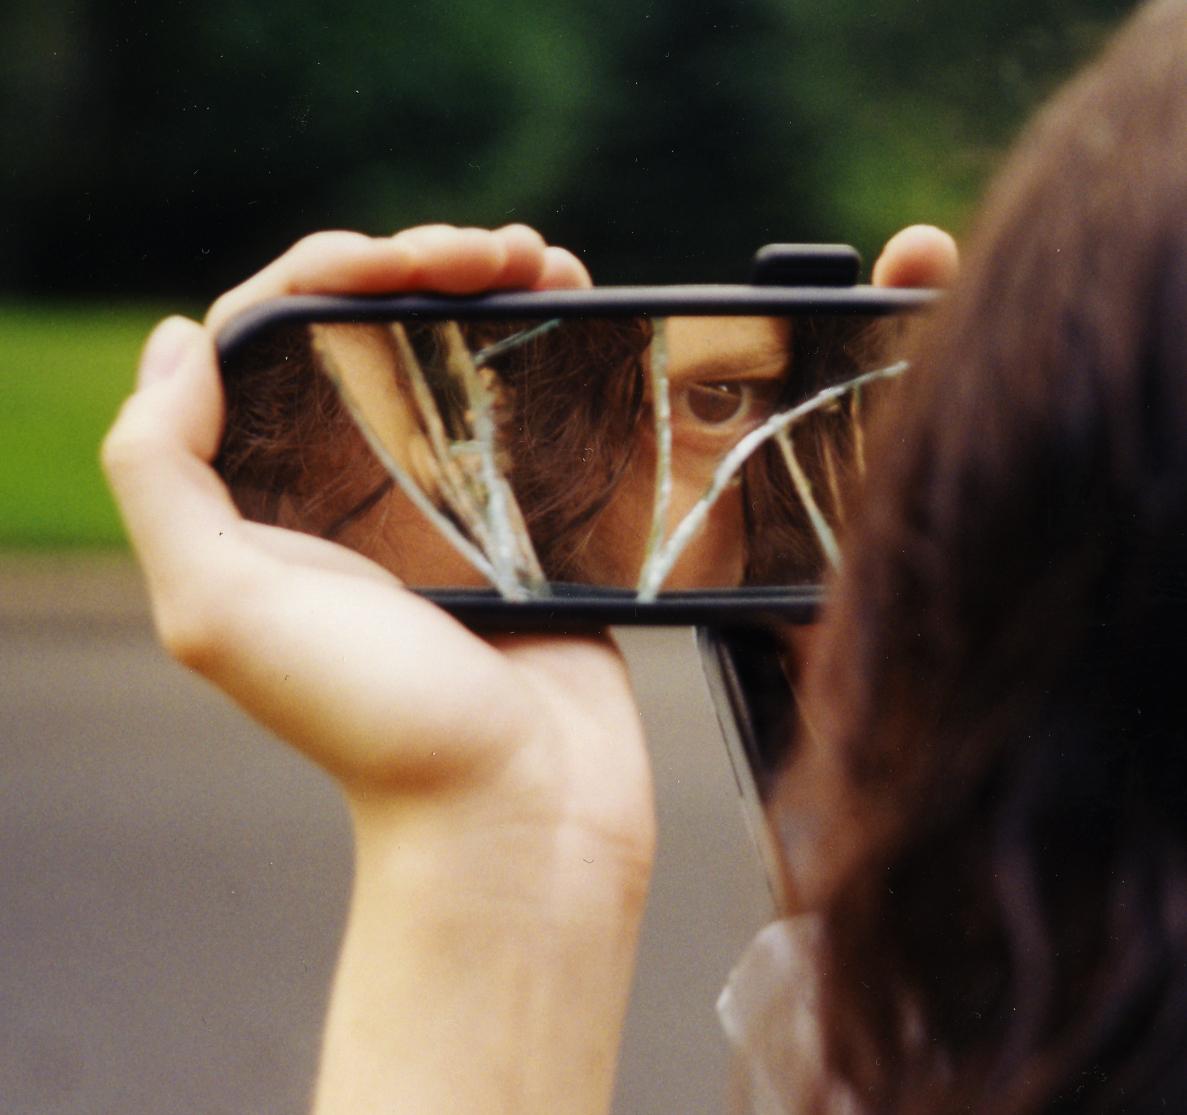 mirroreye